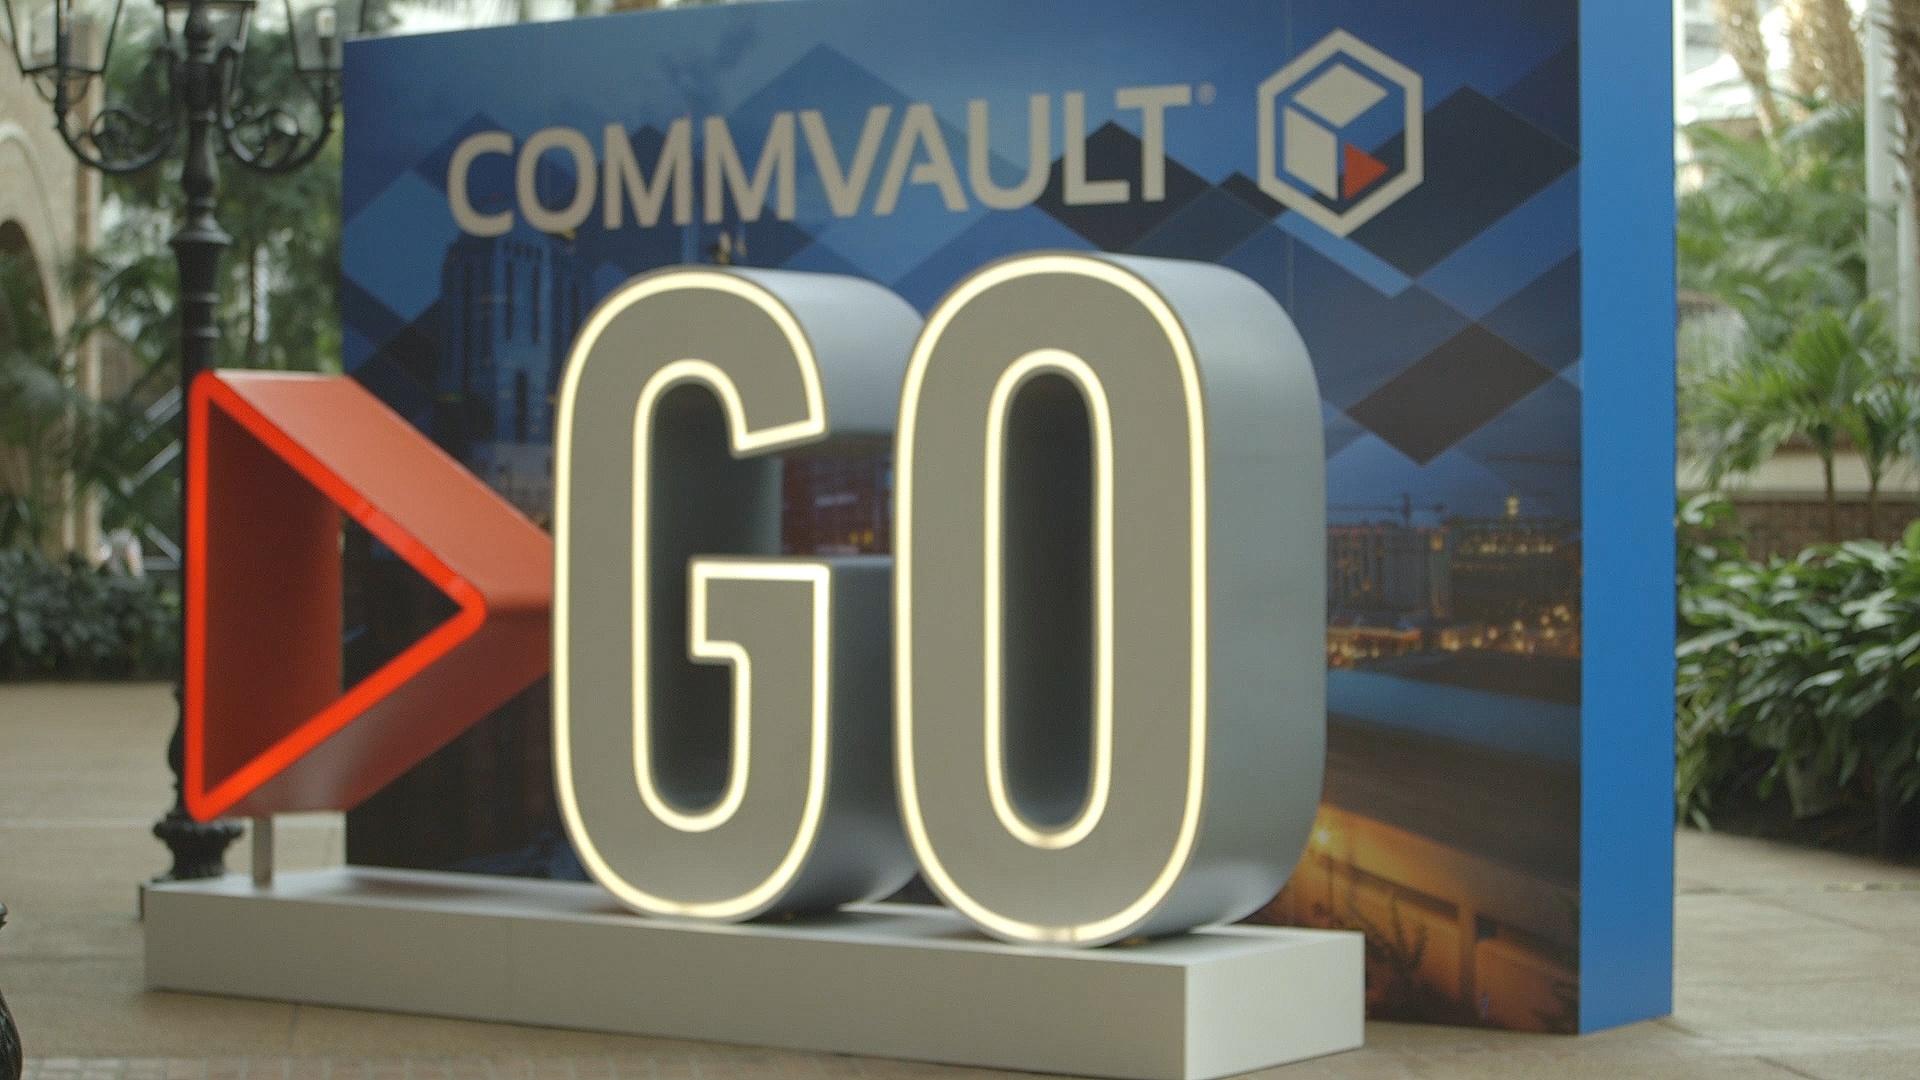 Commvault Go 2018 Video Coverage